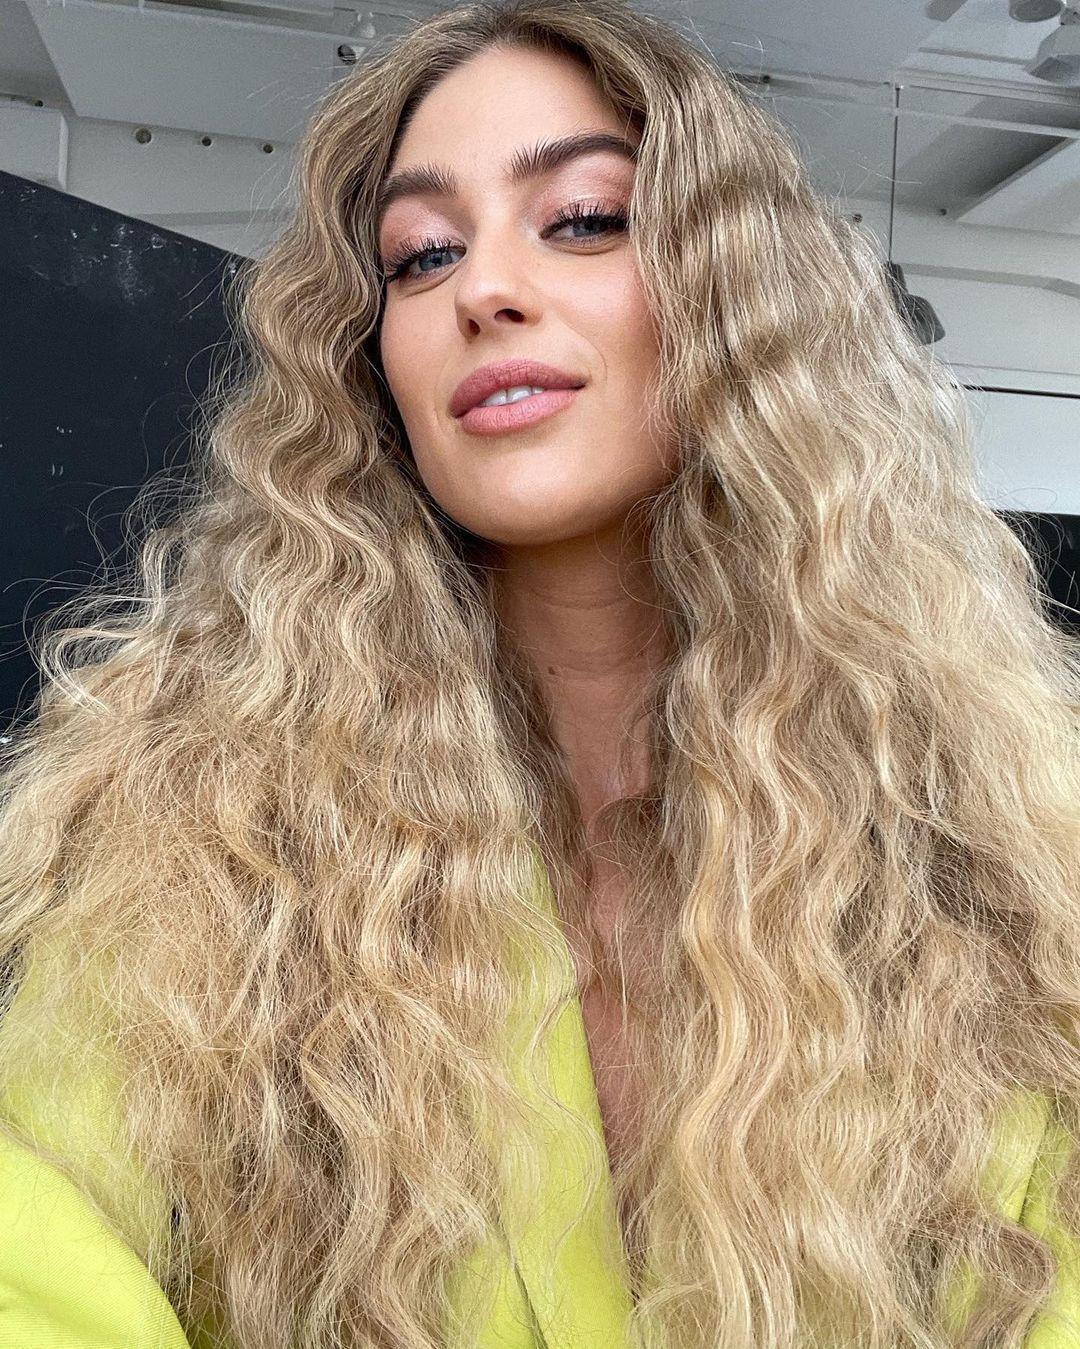 The 4 Best Summer Hairstyles, According to Hailey Bieber's Hairstylist